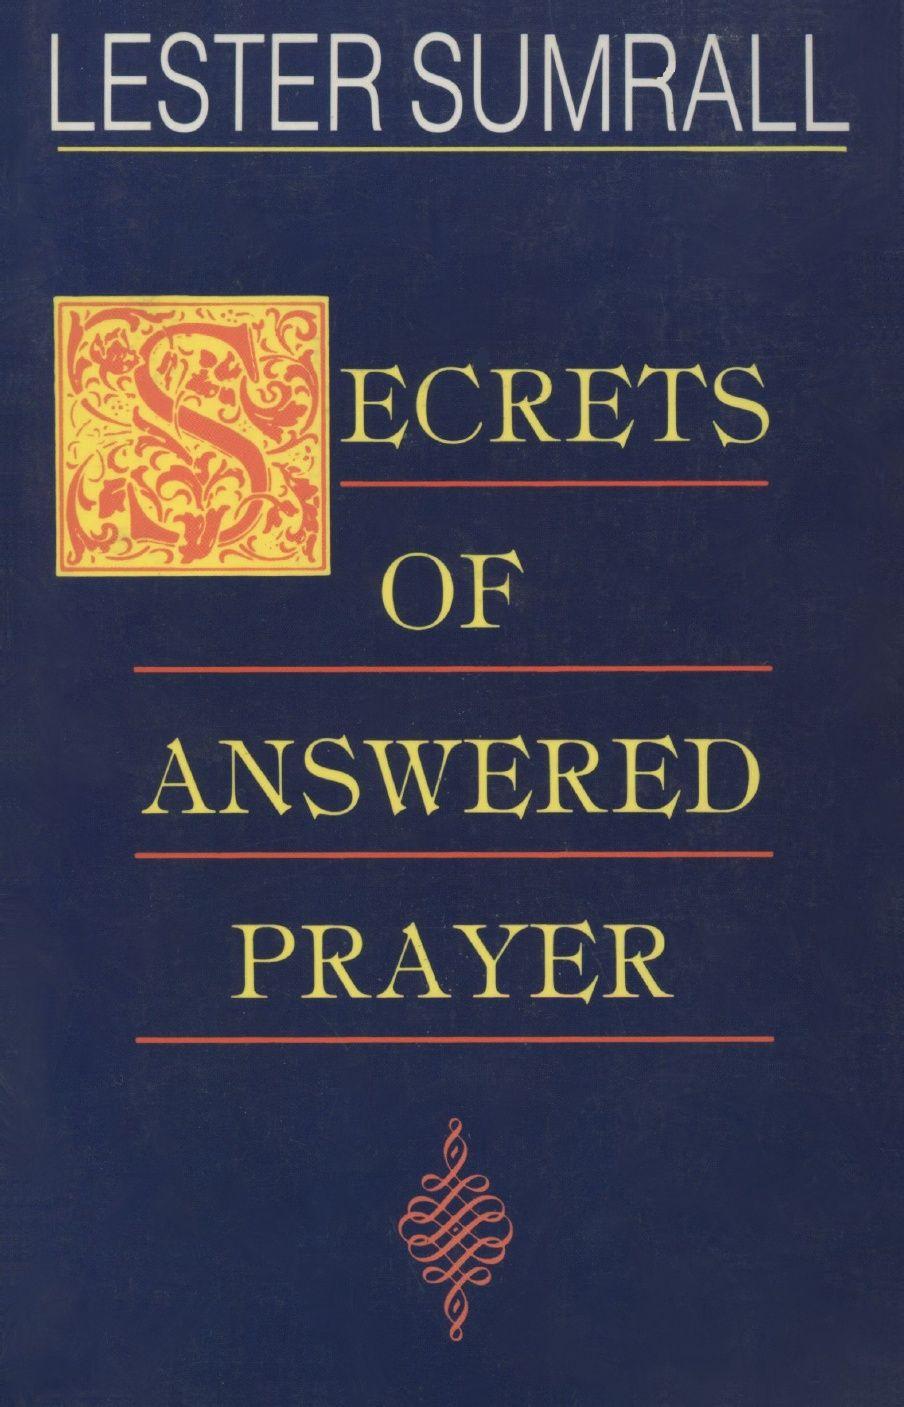 Secrets of Answered Prayer - Lester Sumrall (pdf)